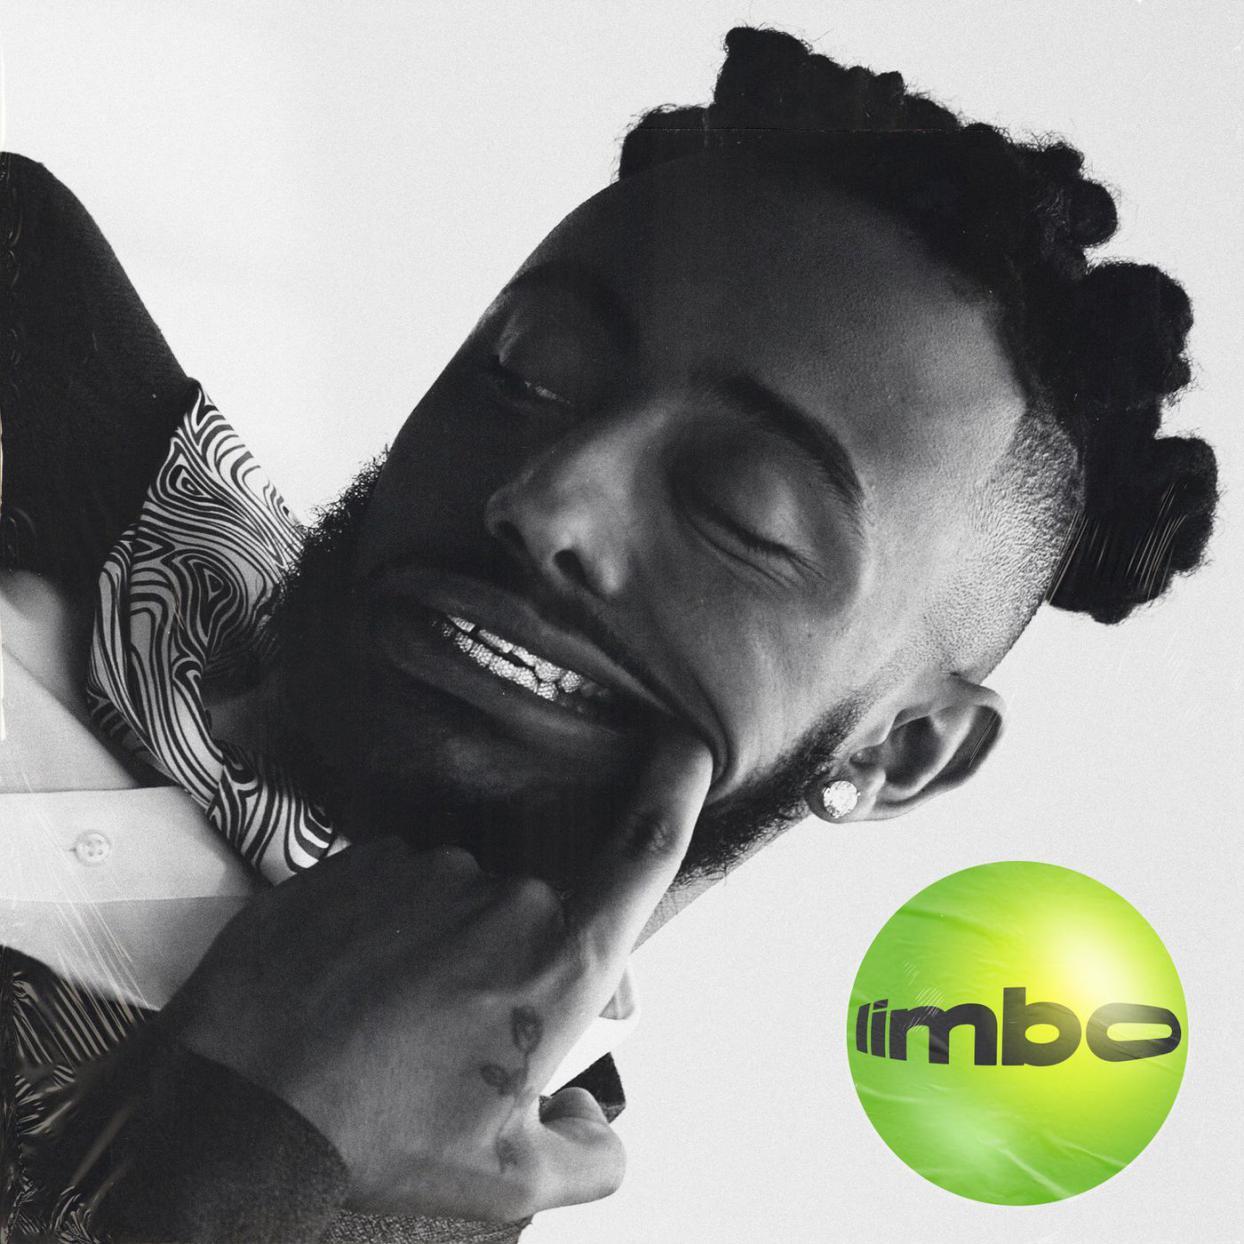 Stream Amine's new album 'Limbo' - REVOLT